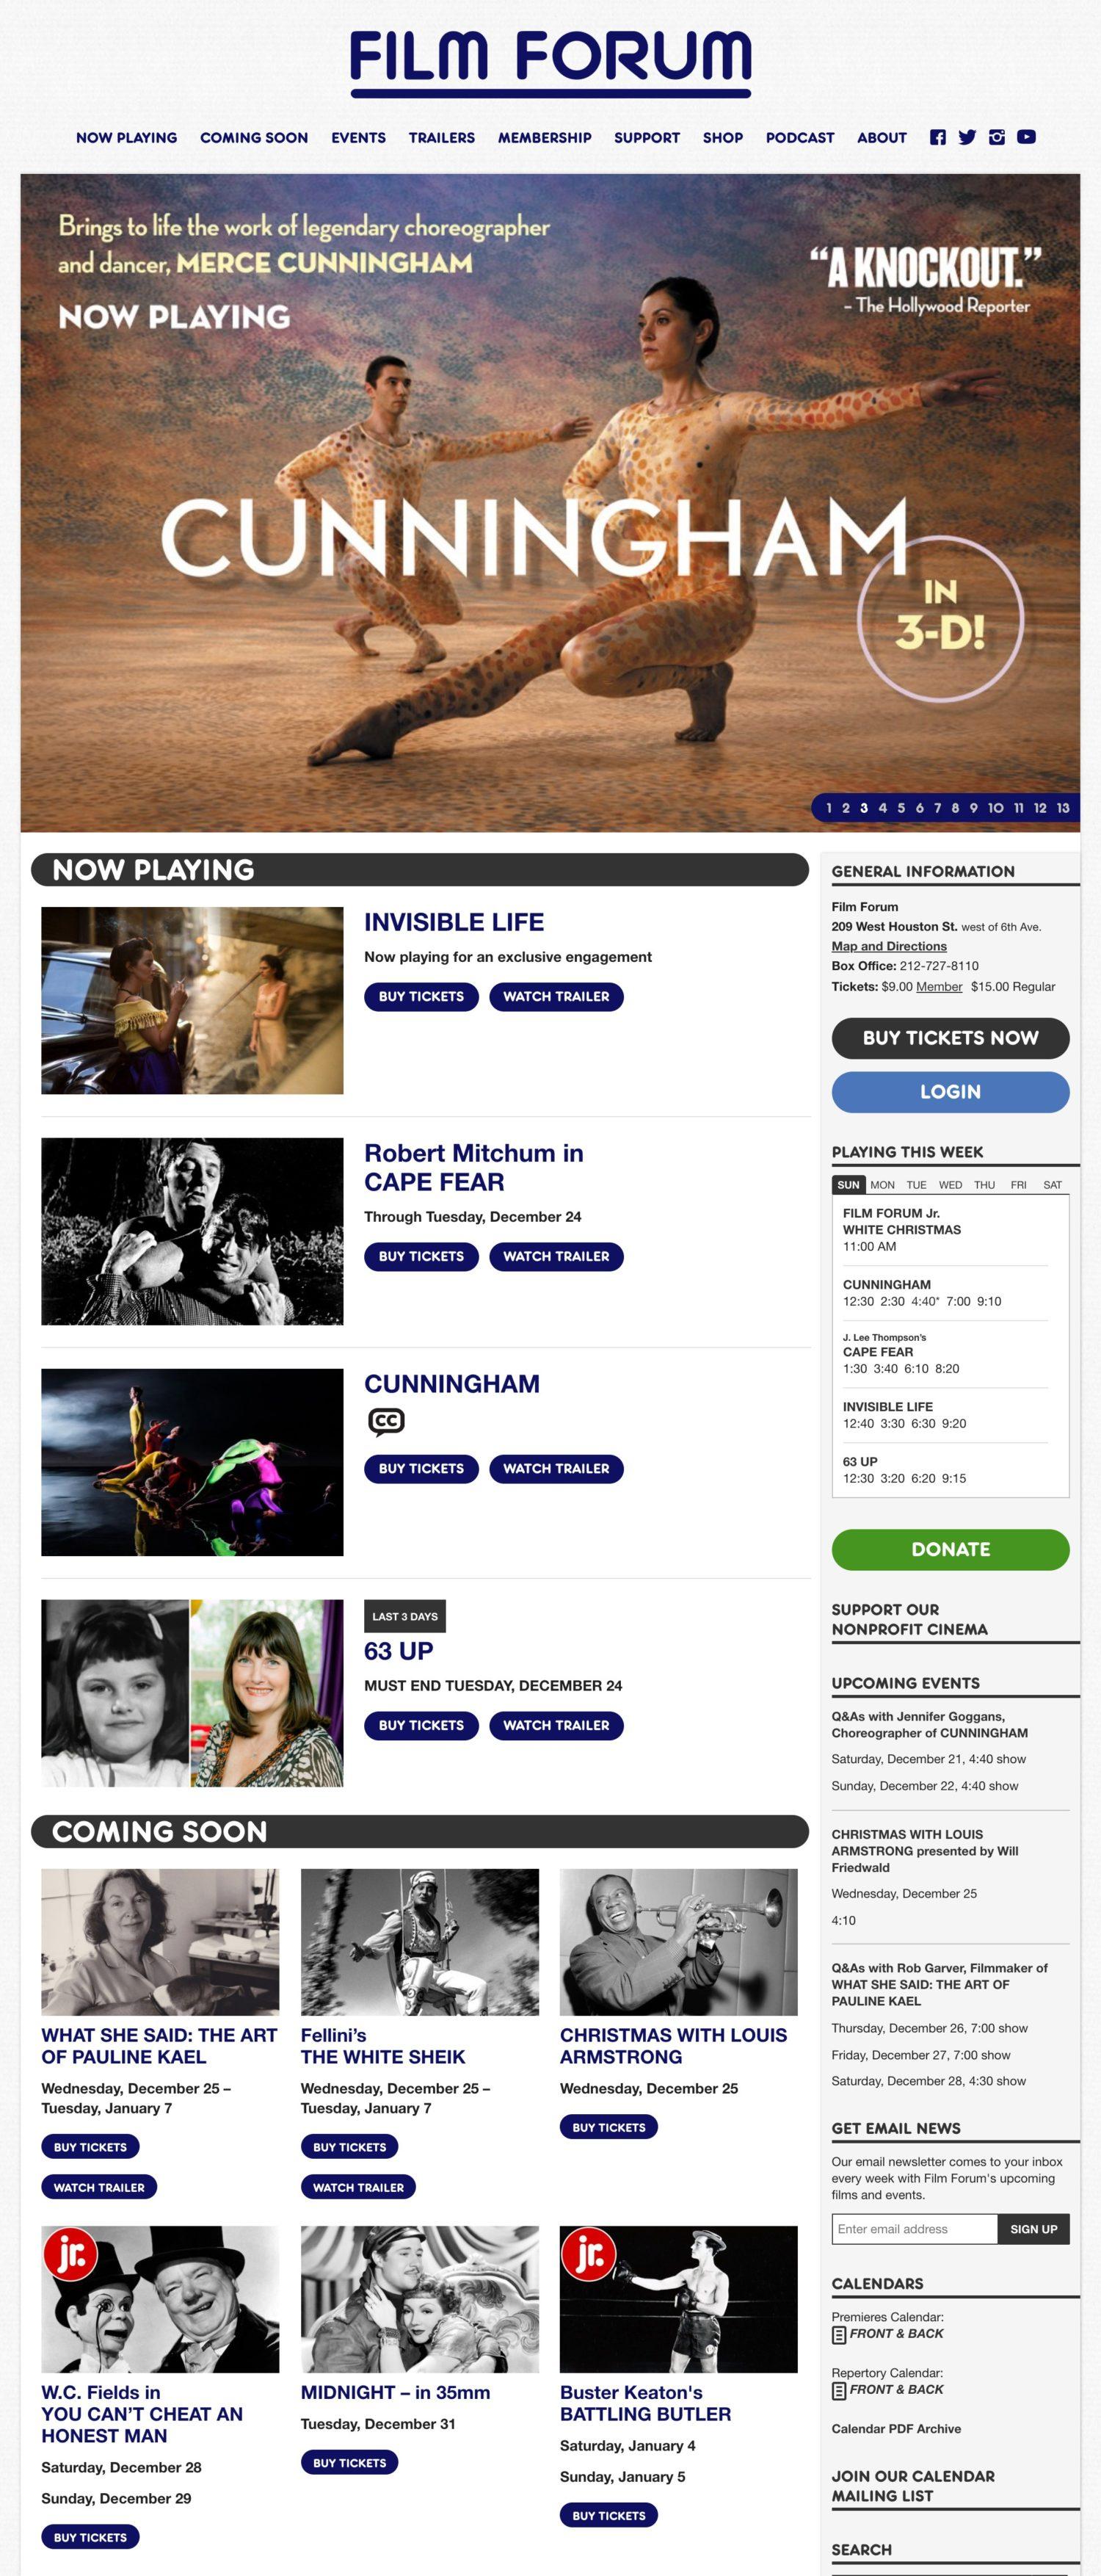 Screenshot of the Film Forum website's homepage